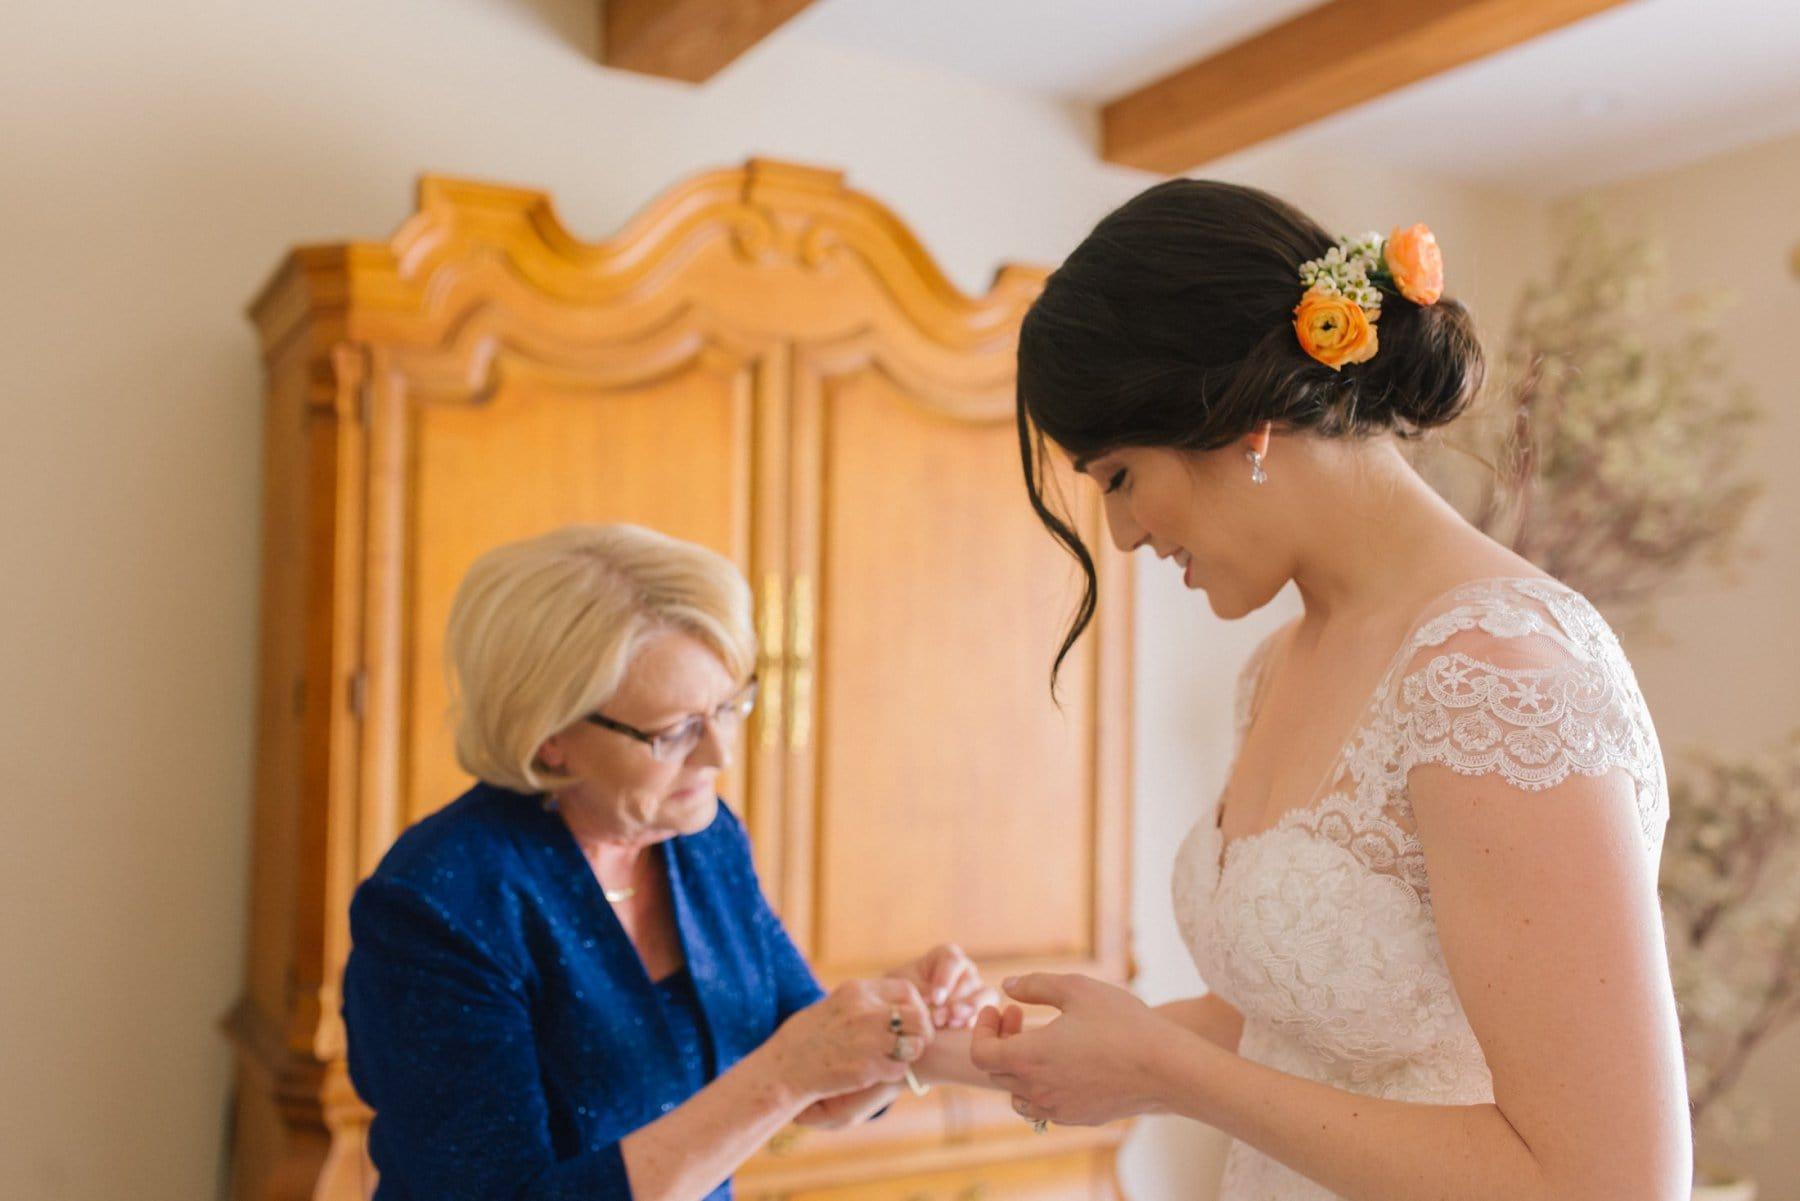 Scottsdale documentary wedding photographer grandma putting on jewelry for bride